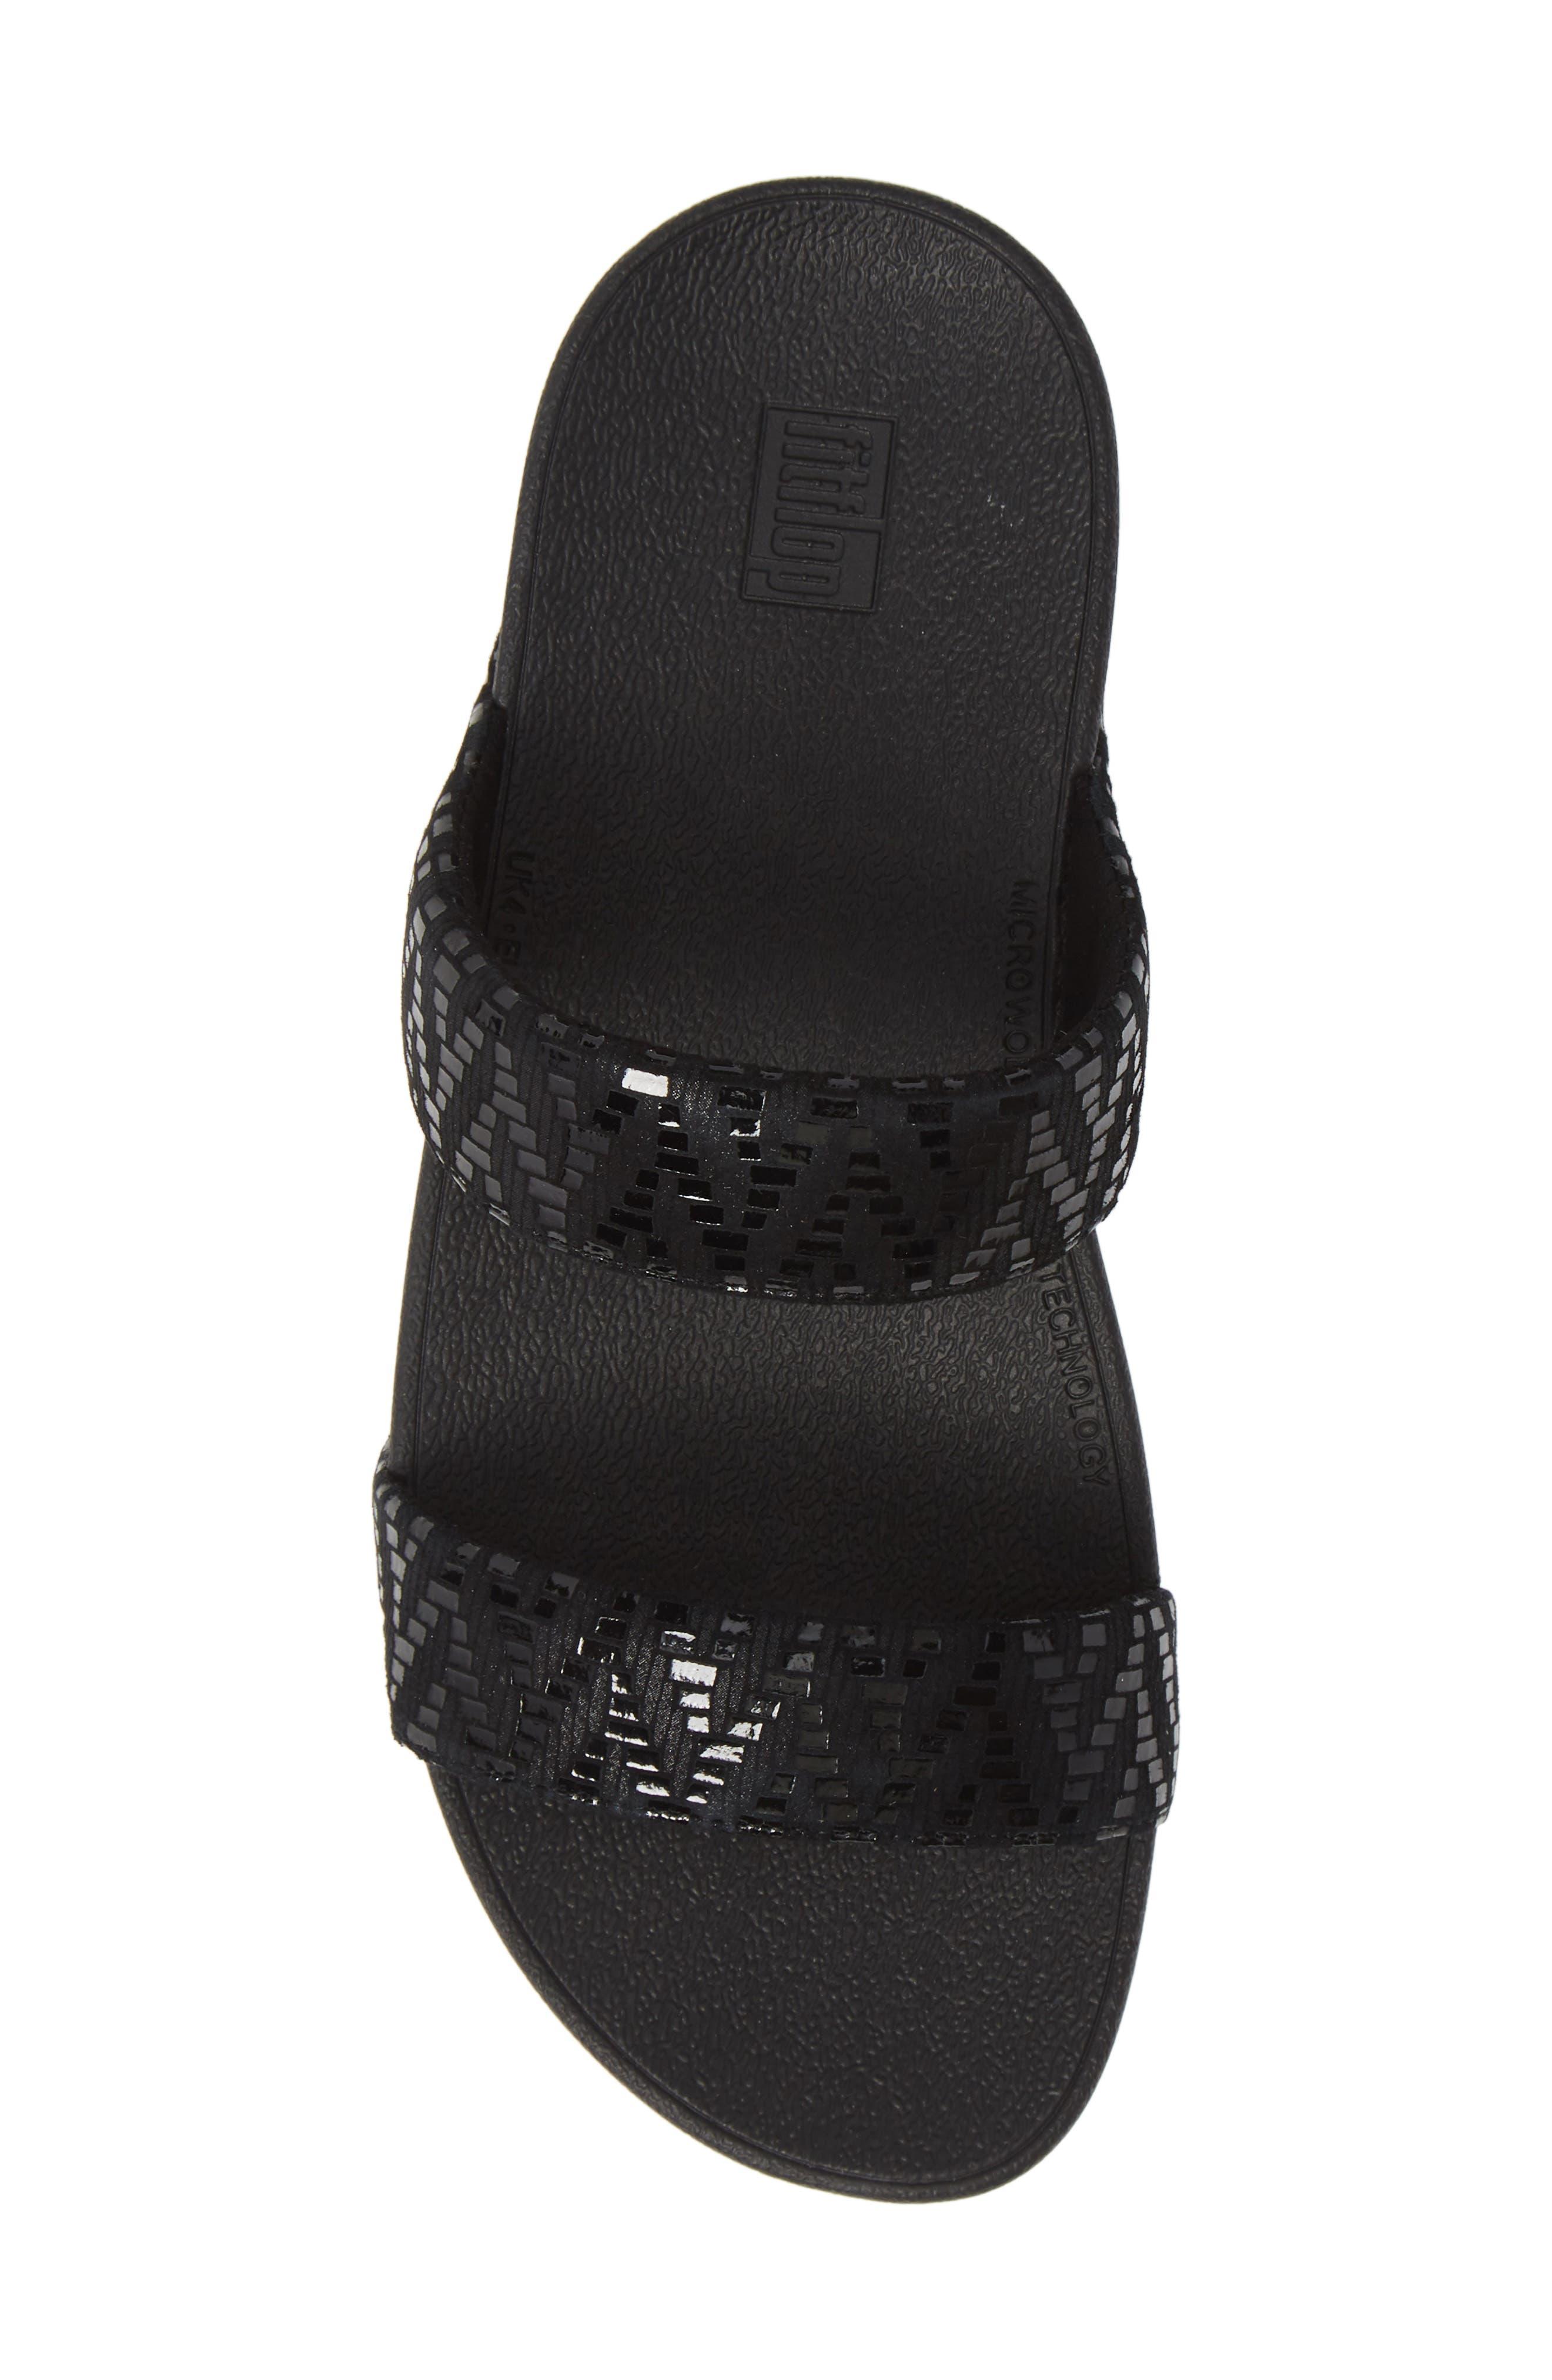 Lottie Chevron Wedge Slide Sandal,                             Alternate thumbnail 5, color,                             BLACK FABRIC